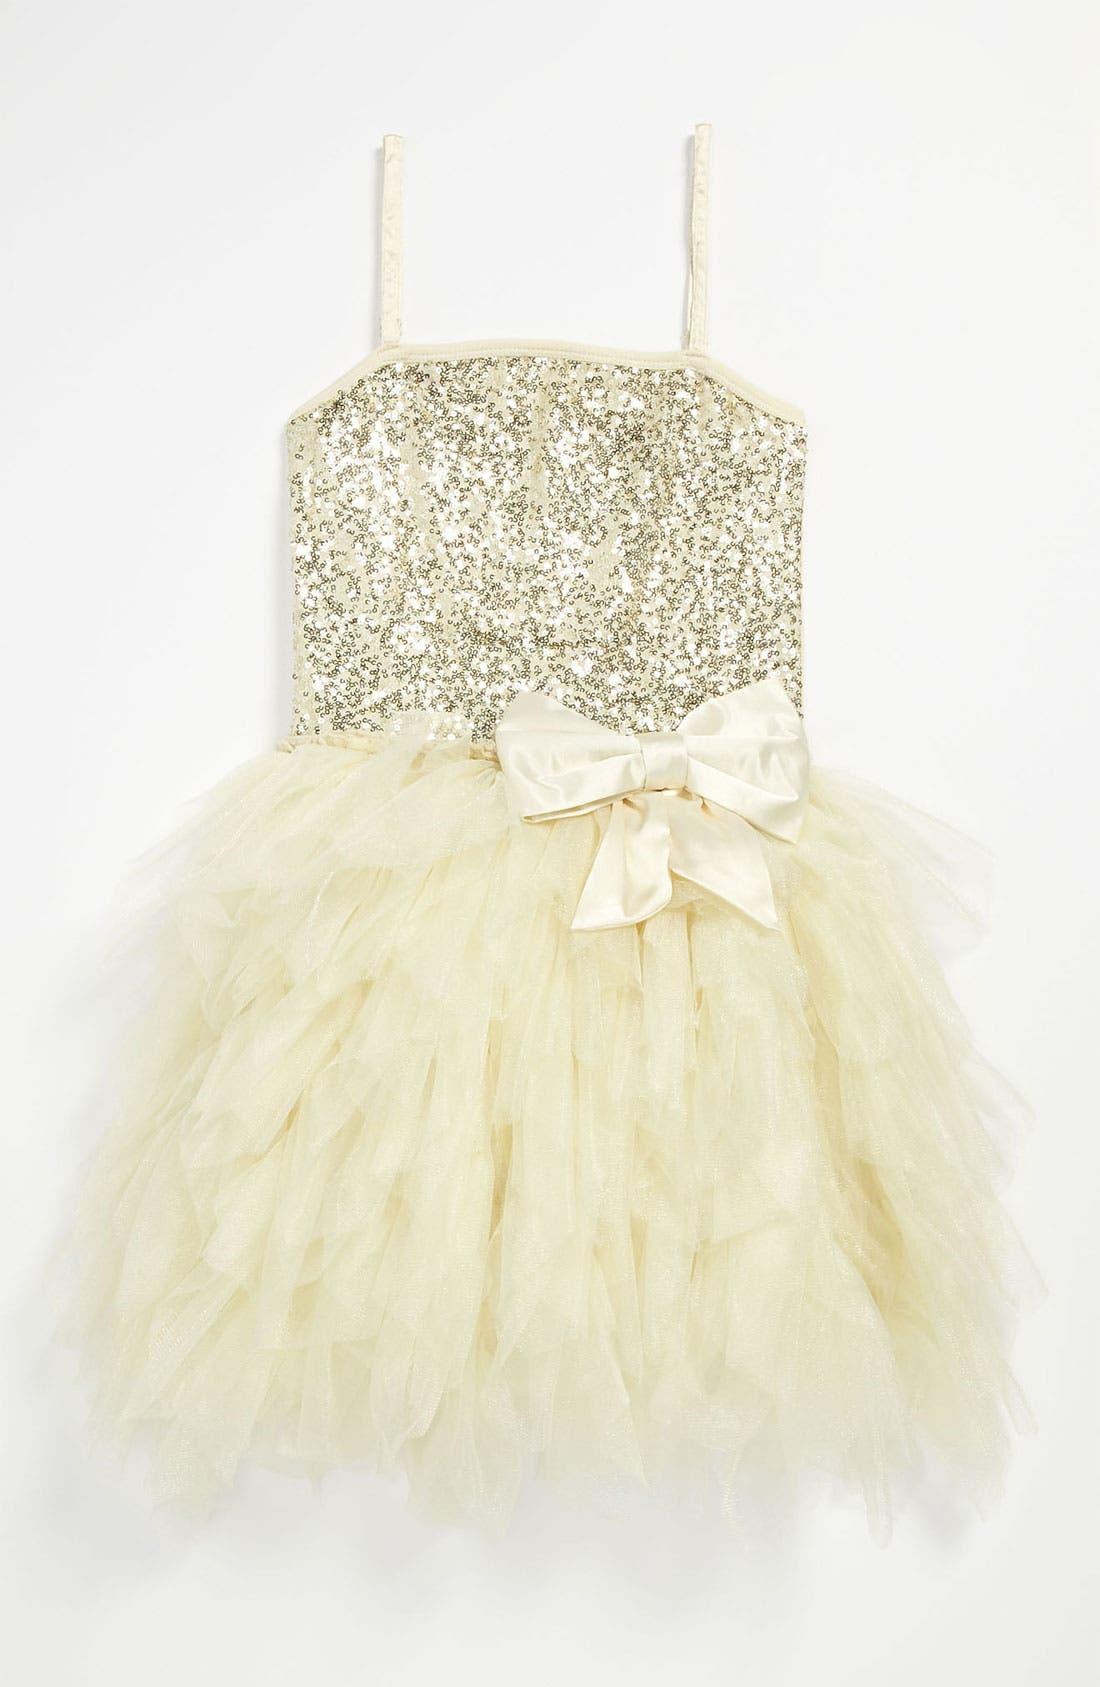 Main Image - Ooh! La, La! Couture 'Wow' Sequin Tutu Dress (Big Girls)